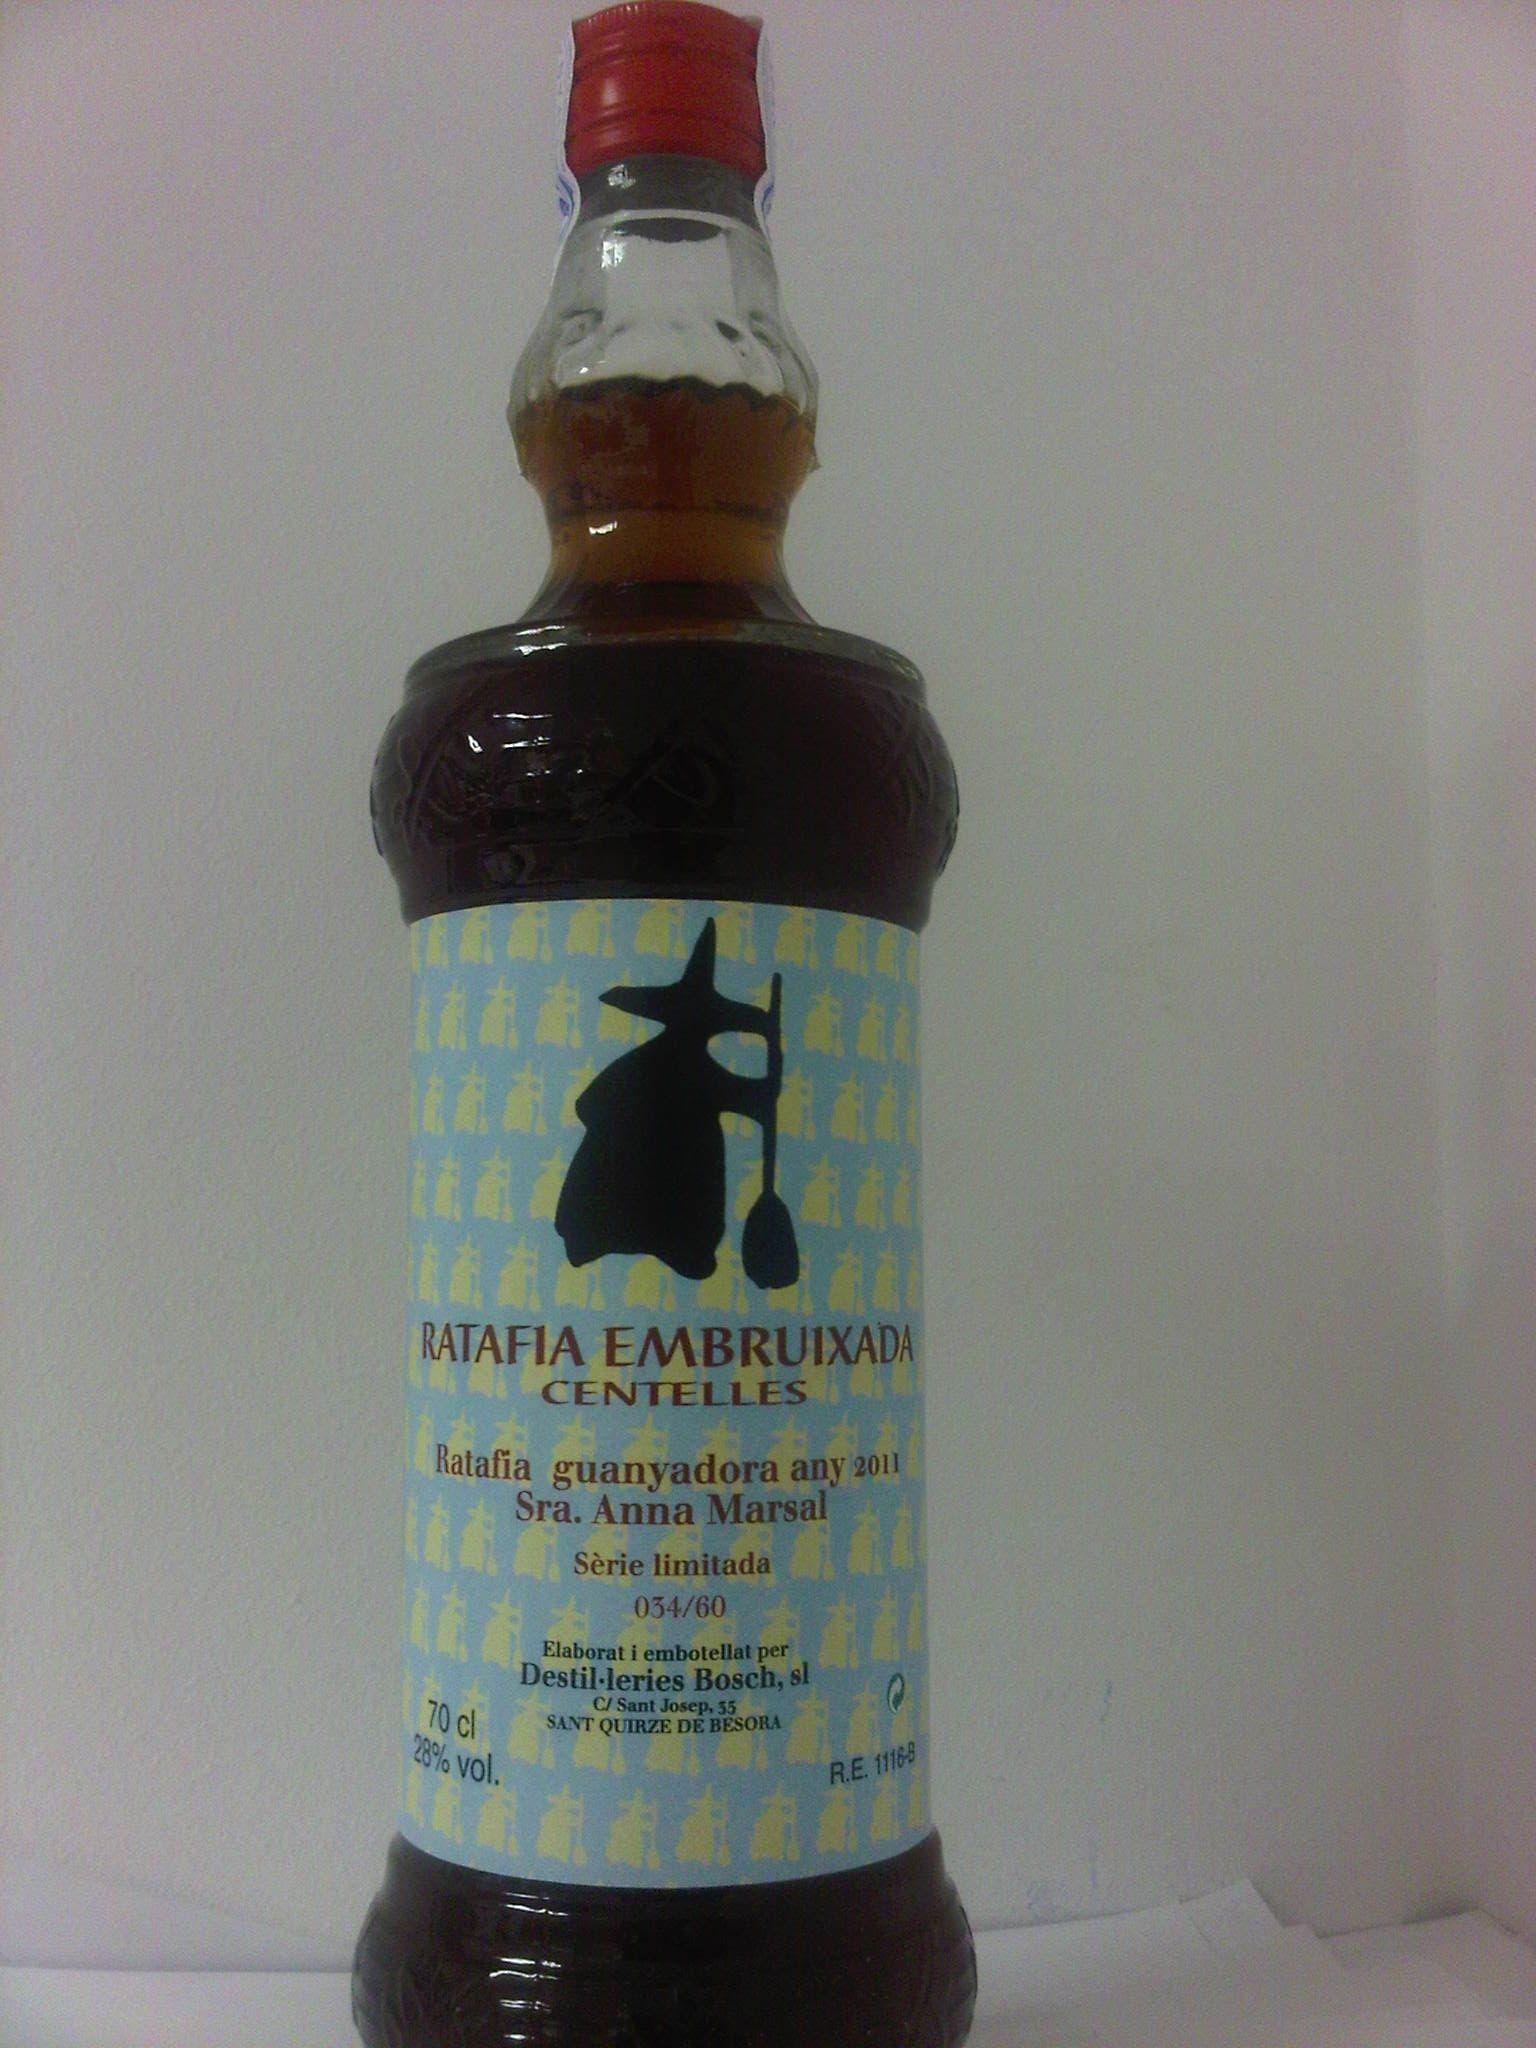 Ratafia Embruixada De Centelles 2013 Ampolla 70 Cl Preu 15 Ampolleta